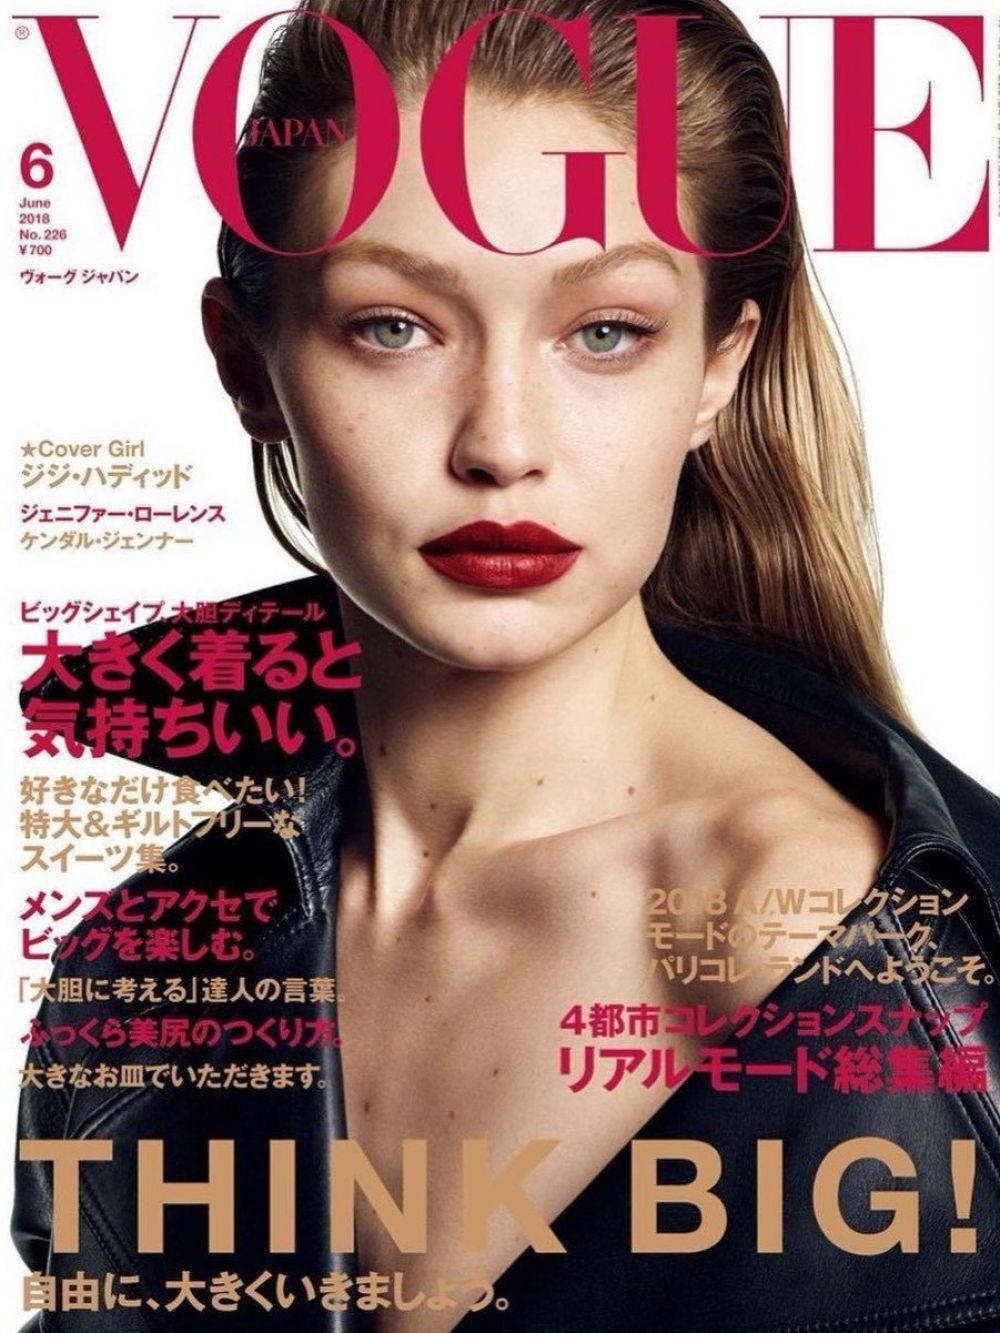 Vogue Magazine Subscription: GIGI HADID In Vogue Magazine, Japan June 2018